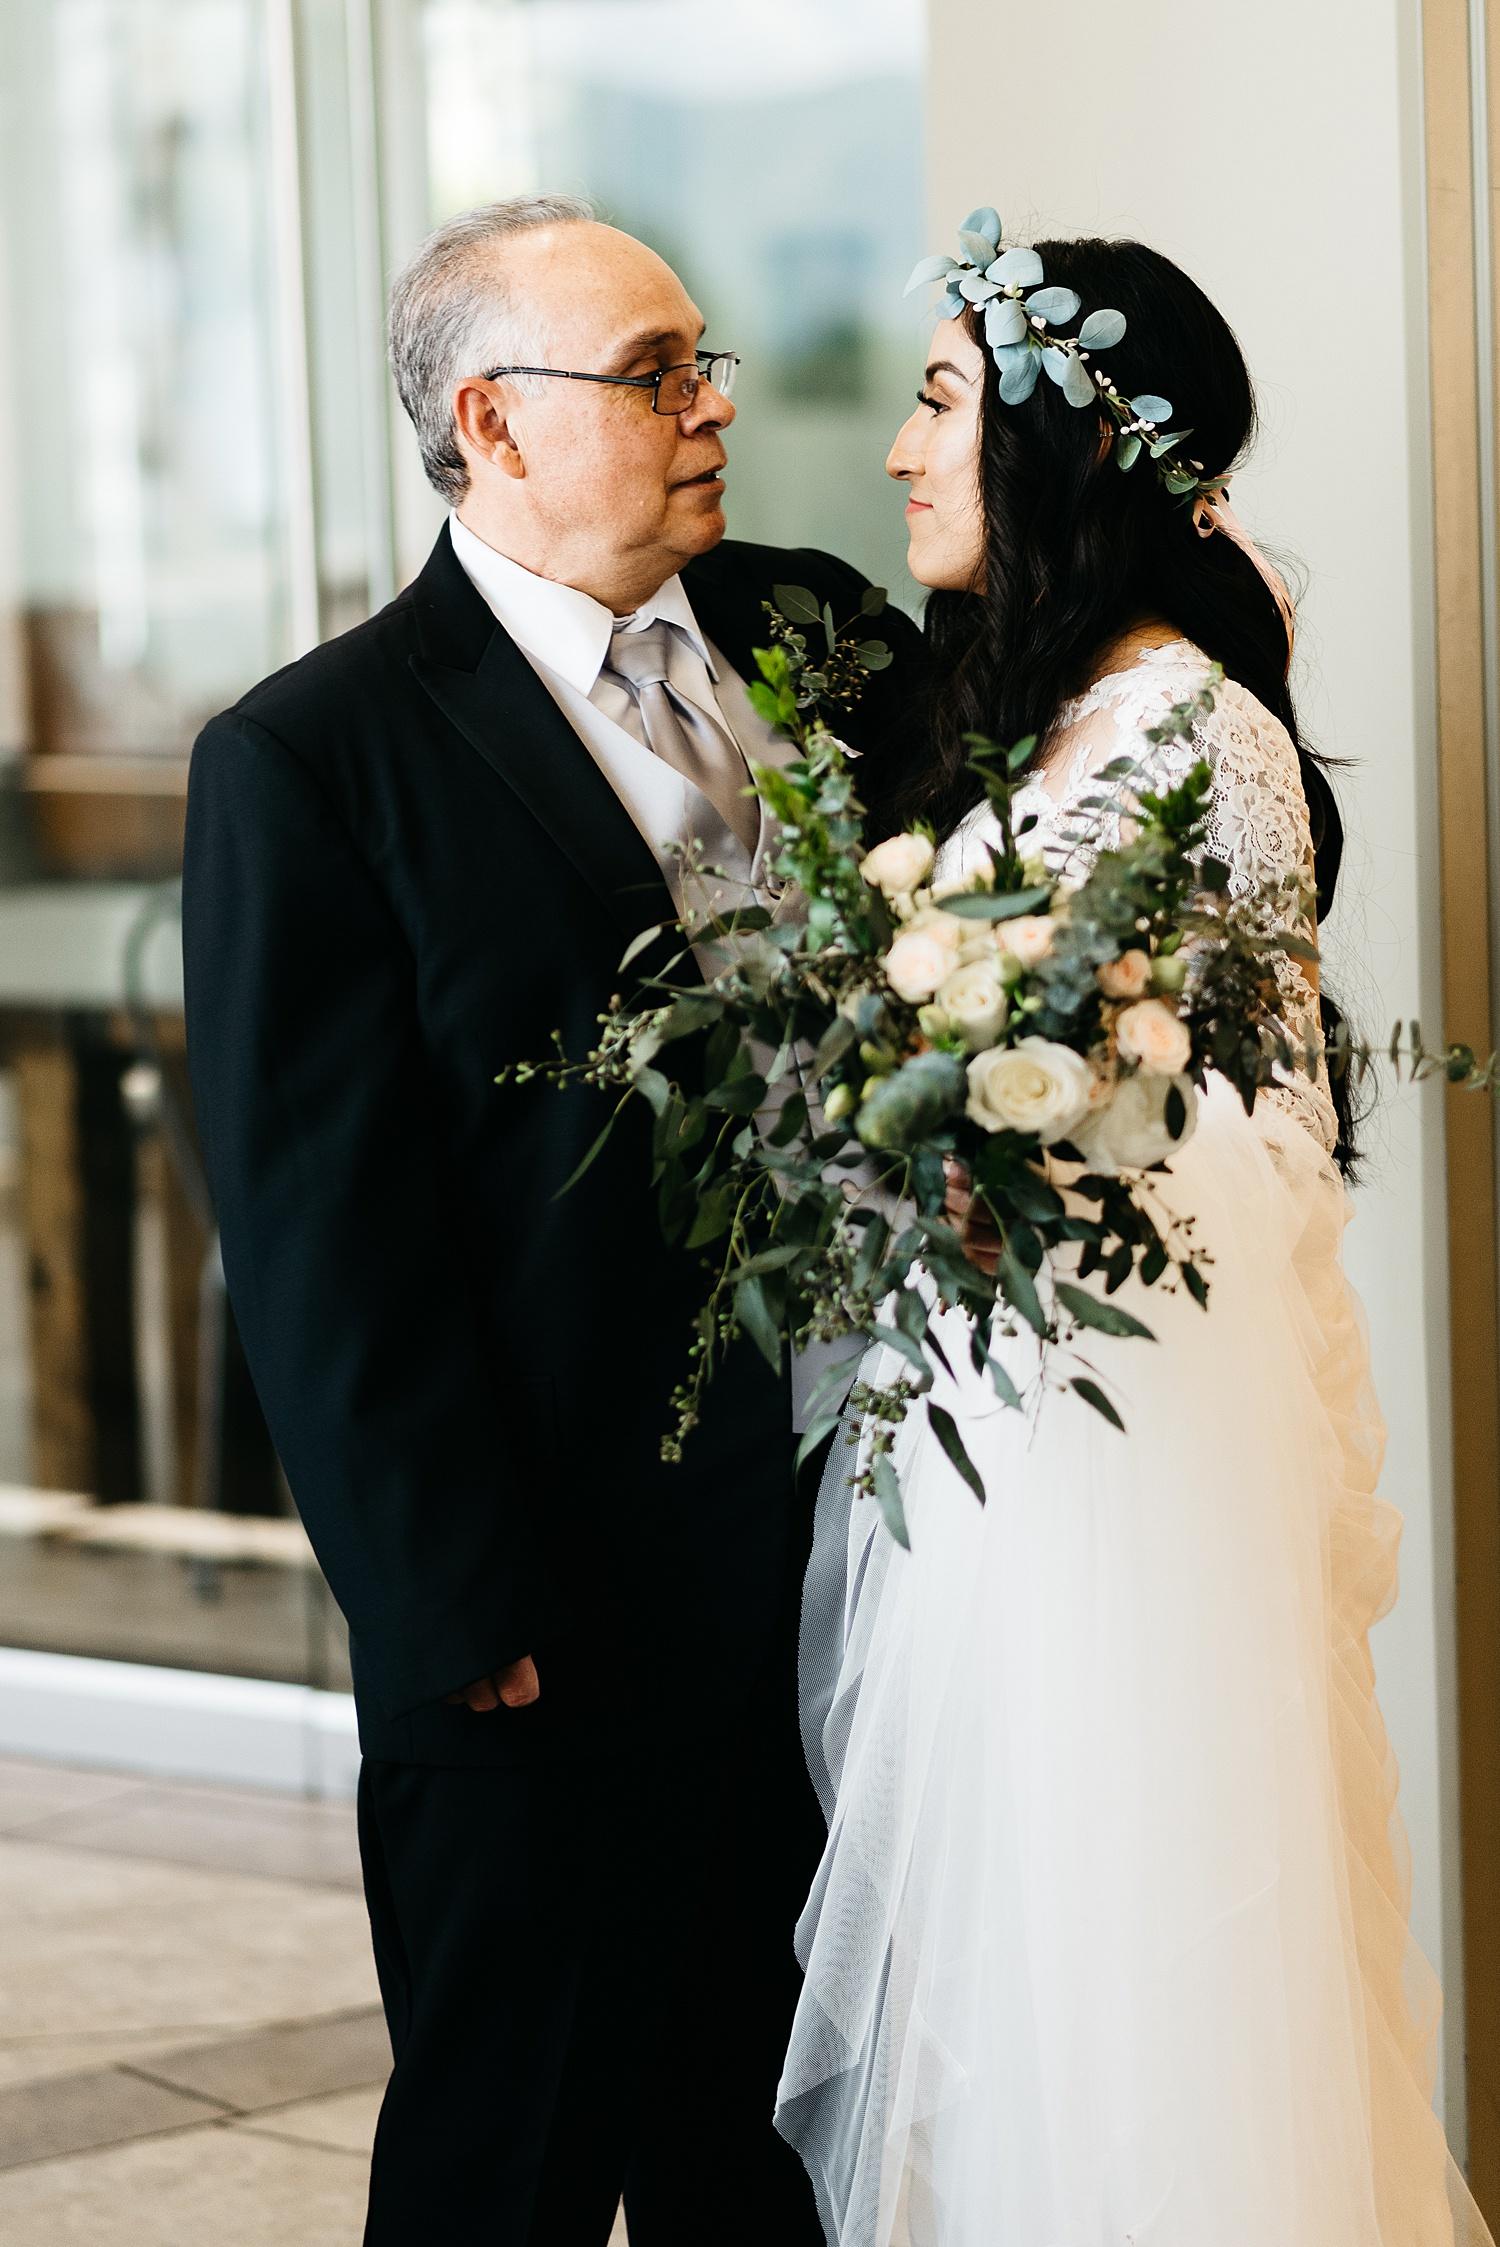 Zandra Barriga Photo - Darian and Colton Wedding_0006.jpg